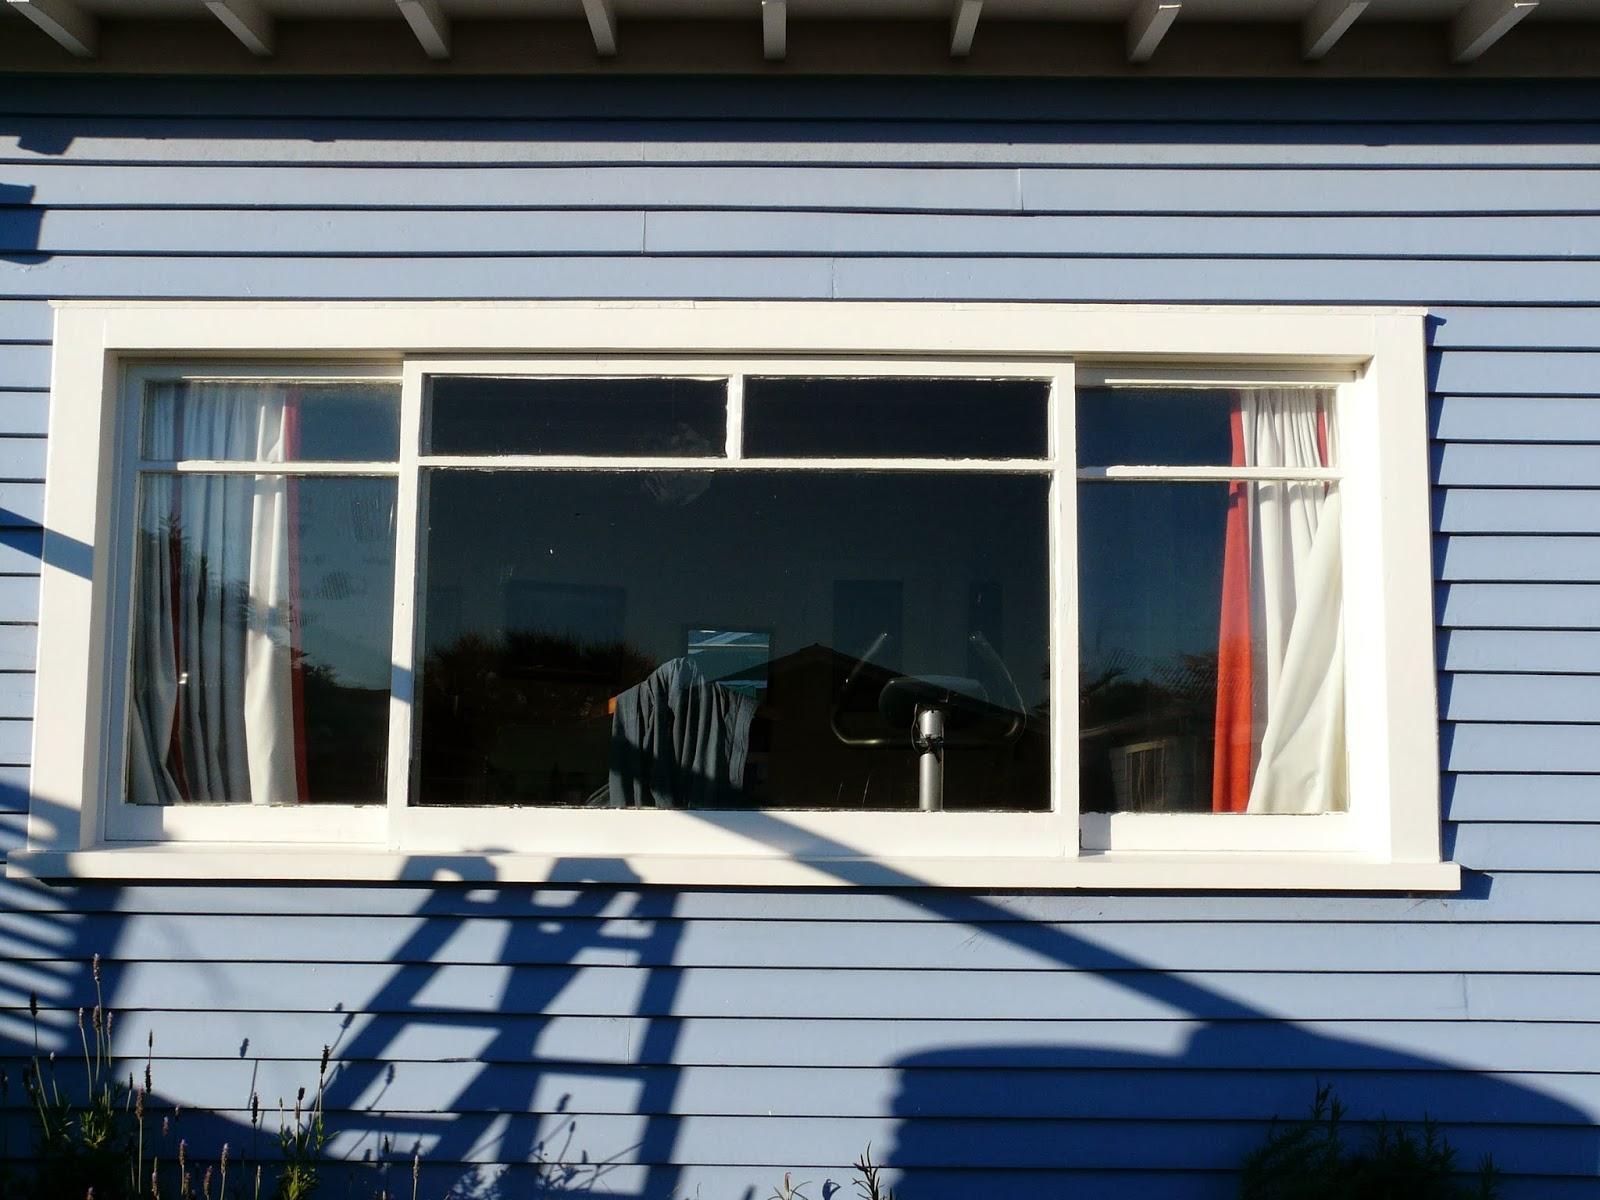 Retrofit Double Glazing Wooden Frames Doubleglazingdiagram Retroing My Experiences The Beacon Blog